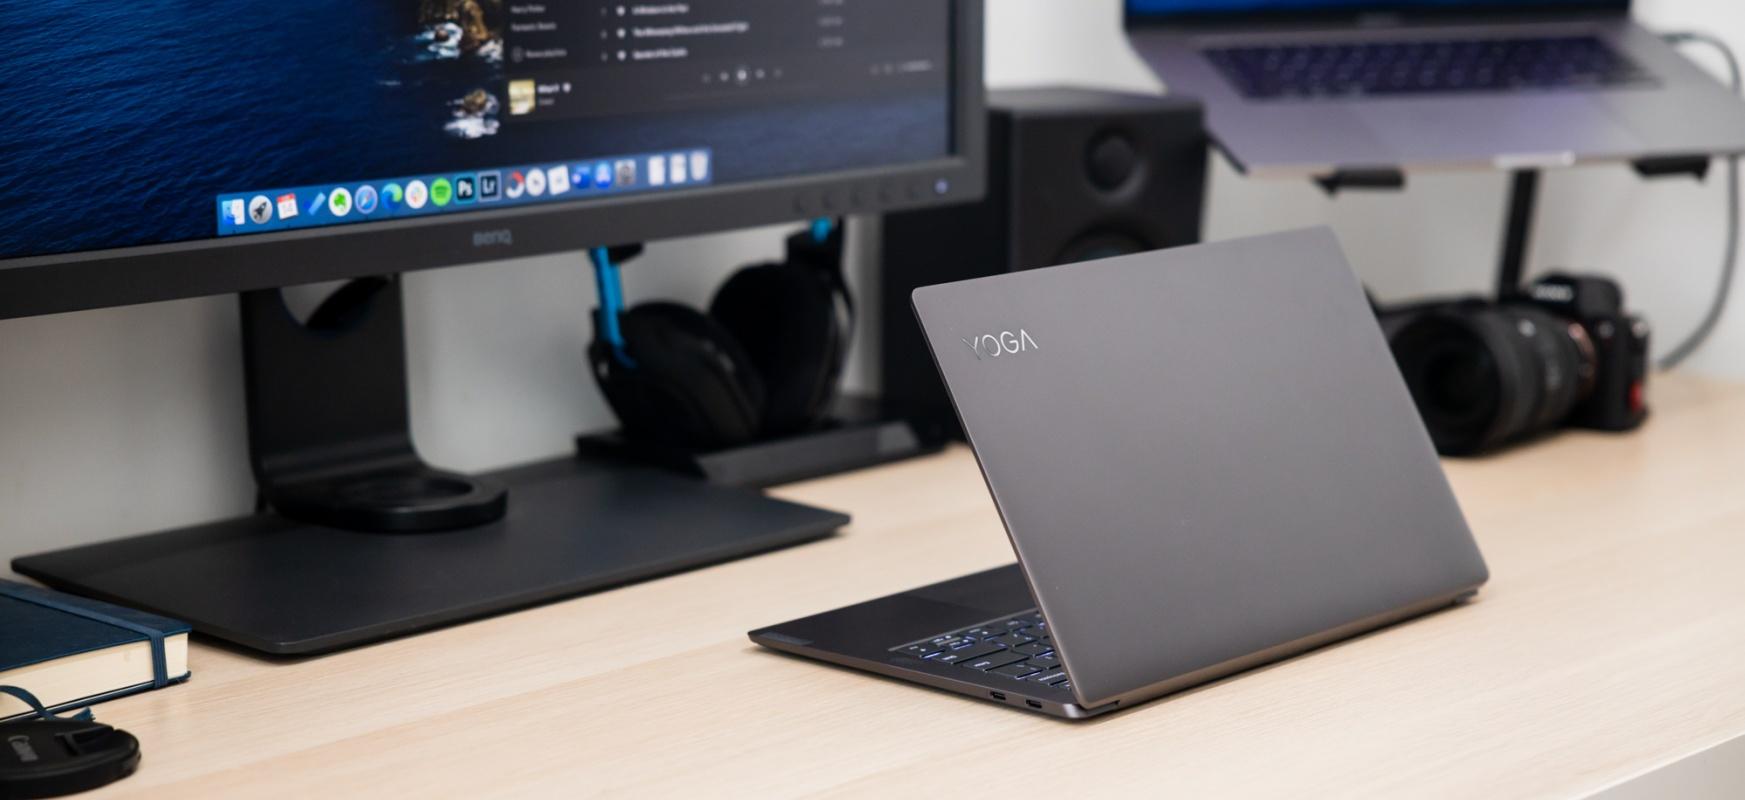 Artelan mugikorra.  Lenovo Yoga S940 - berrikuspena